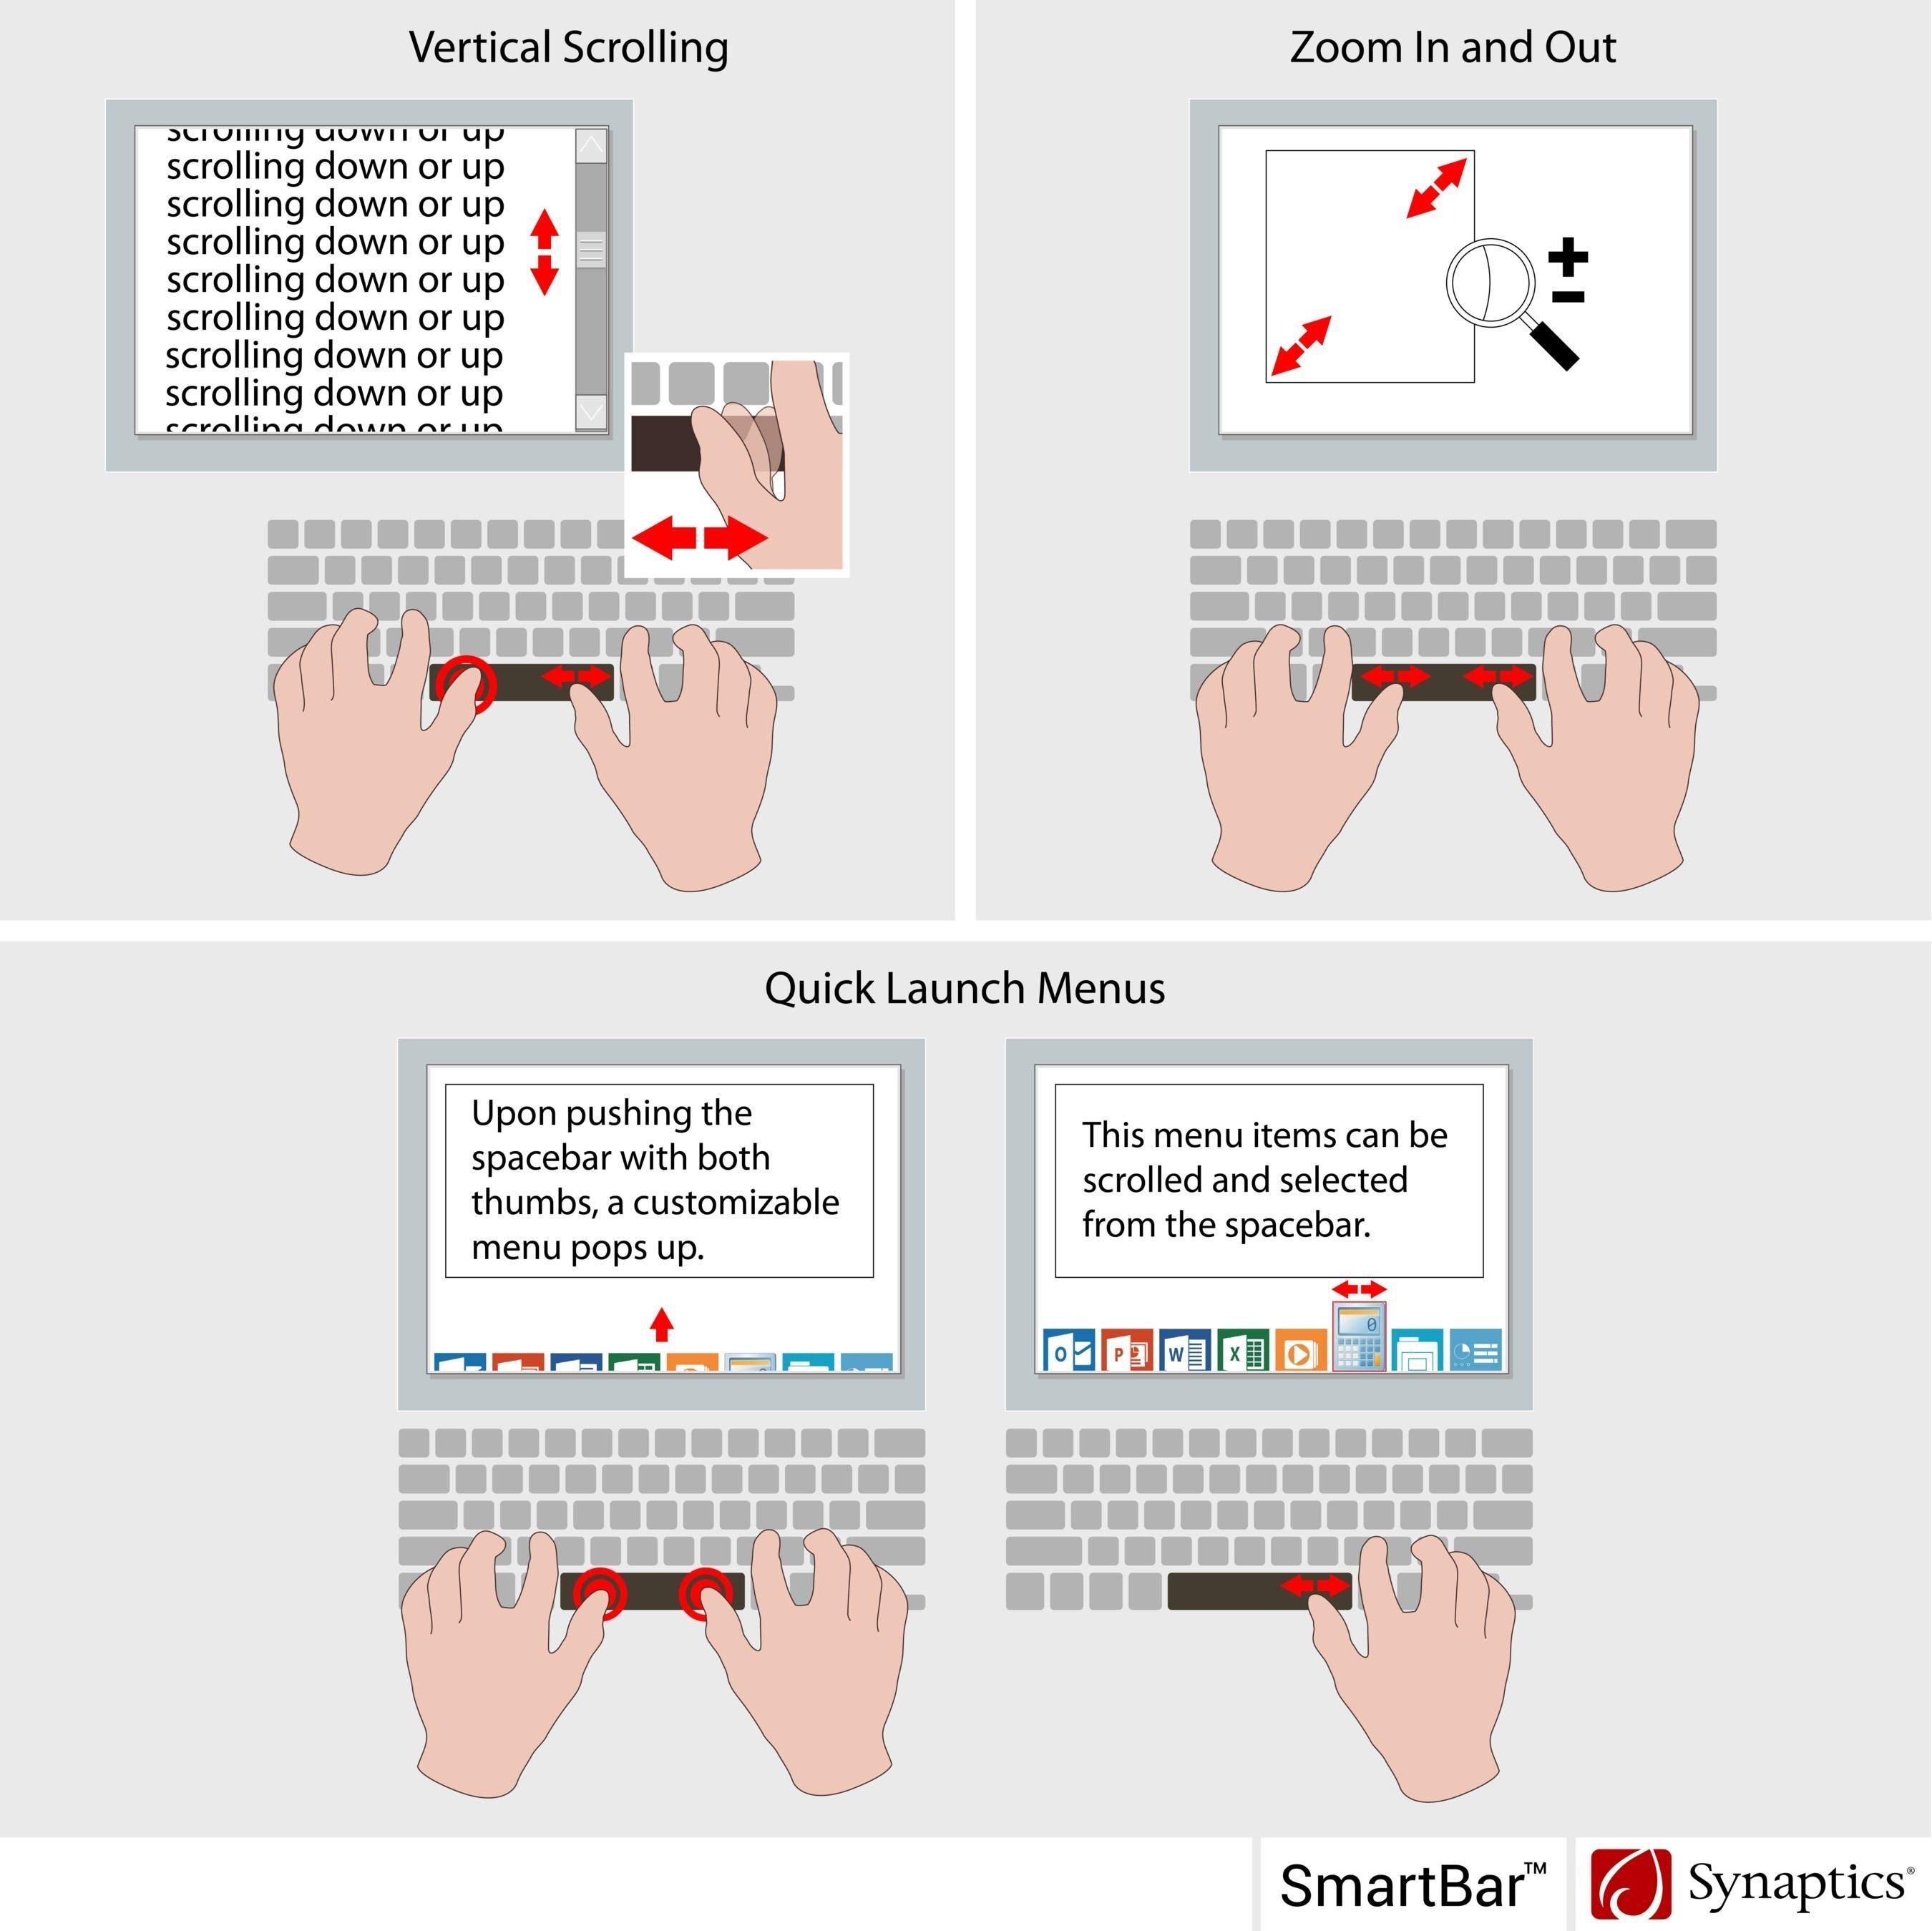 Synaptics SmartBar